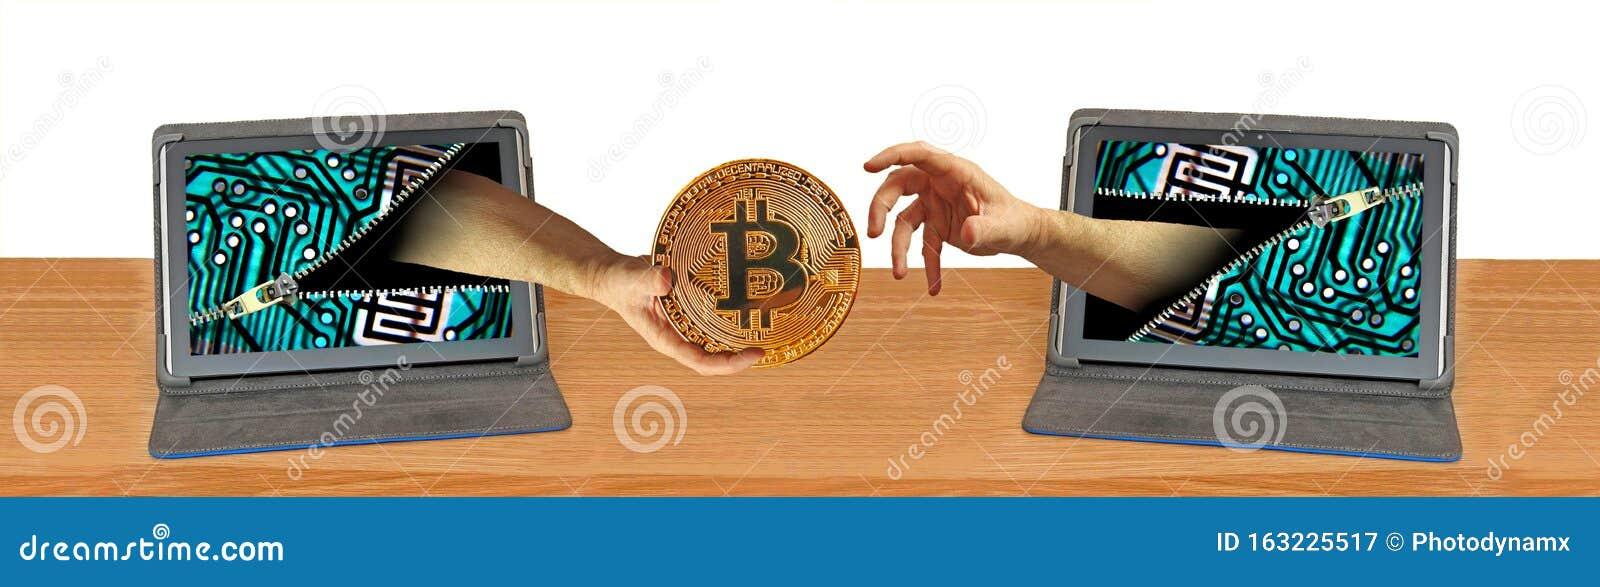 bitcoin on computer